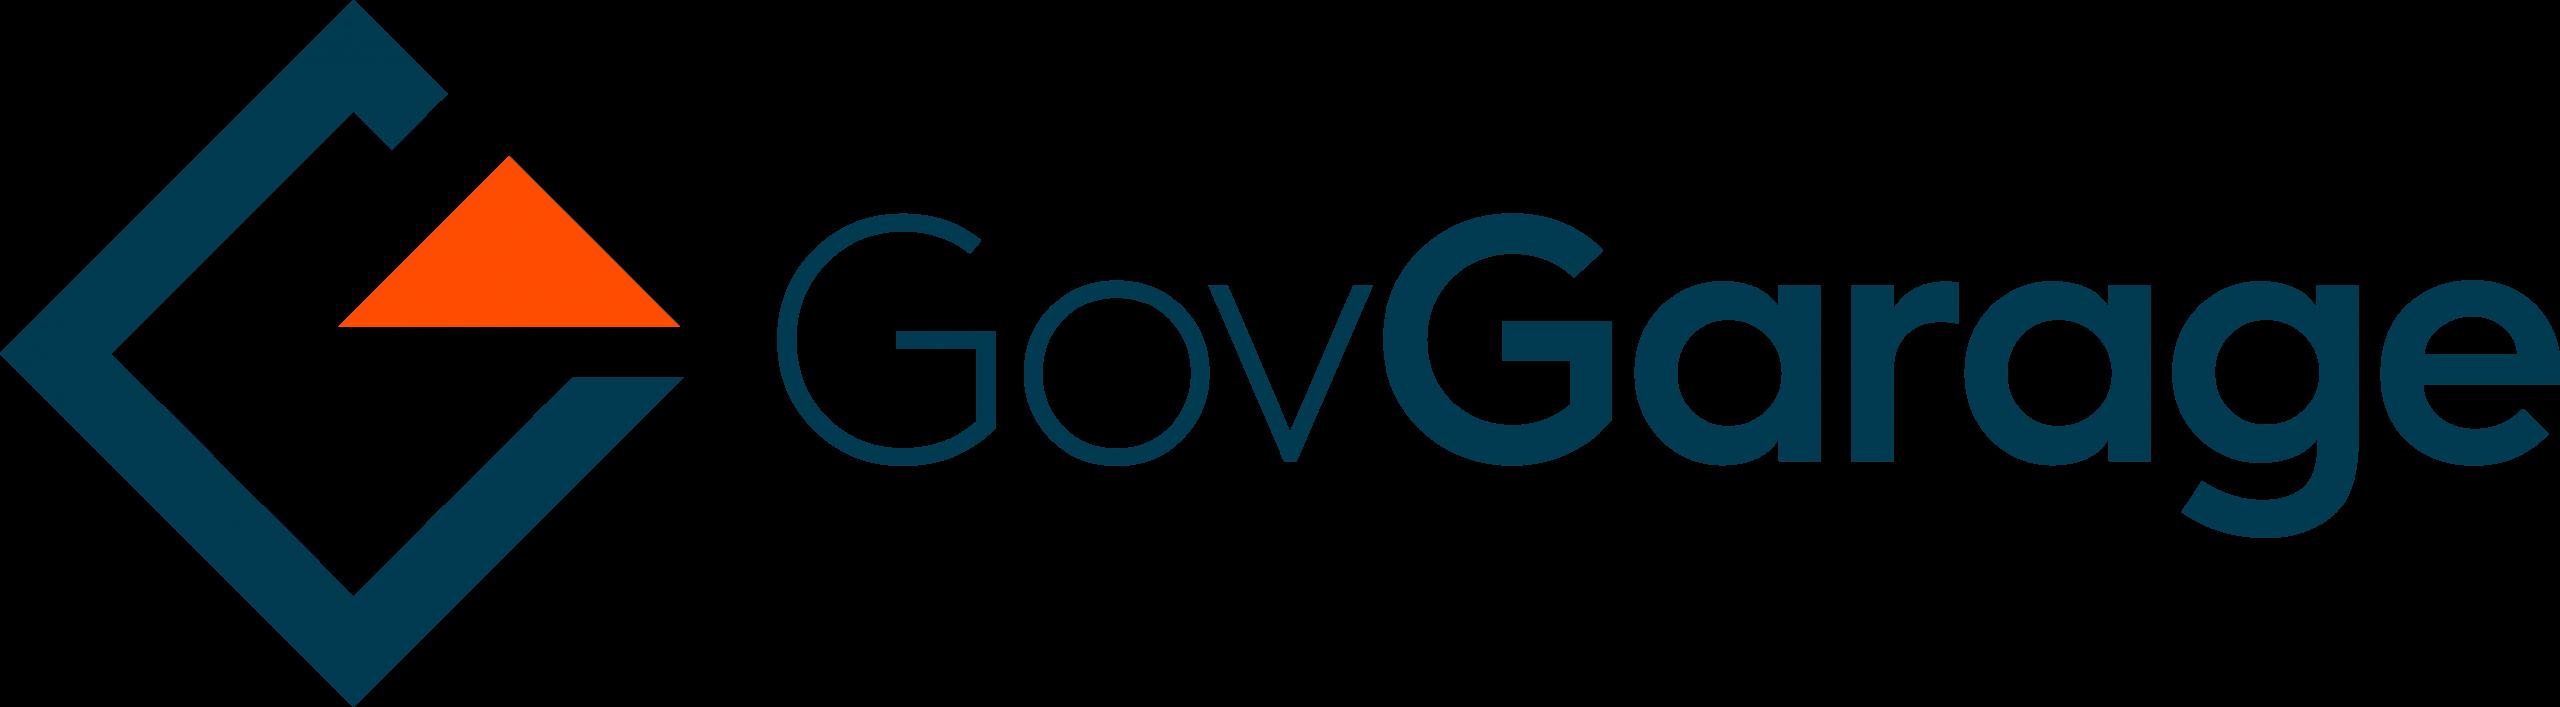 GovGarage